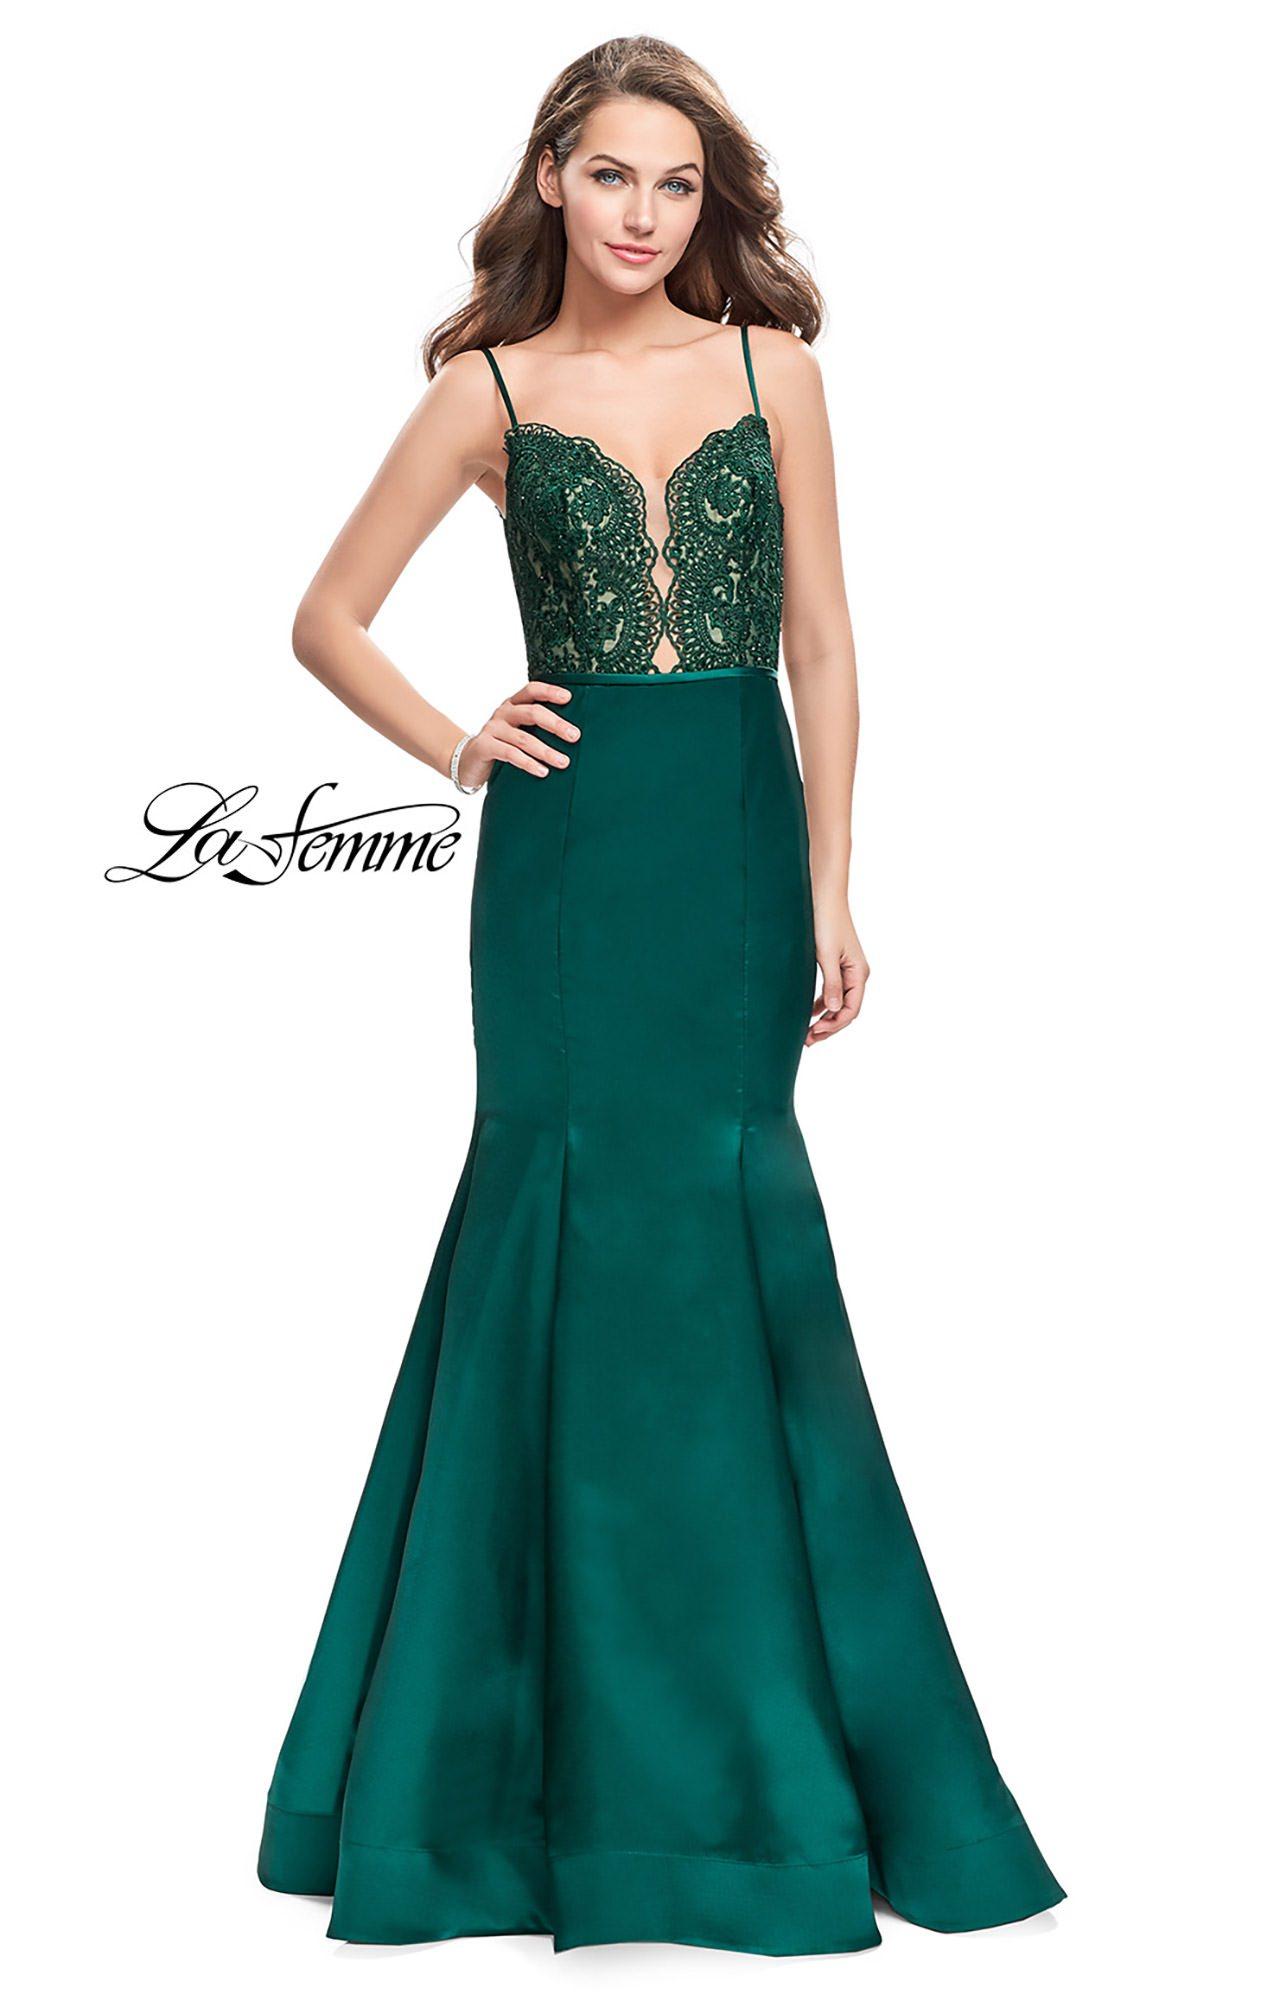 Amazing Prom Dress Stores Charlotte Nc Vignette - All Wedding ...